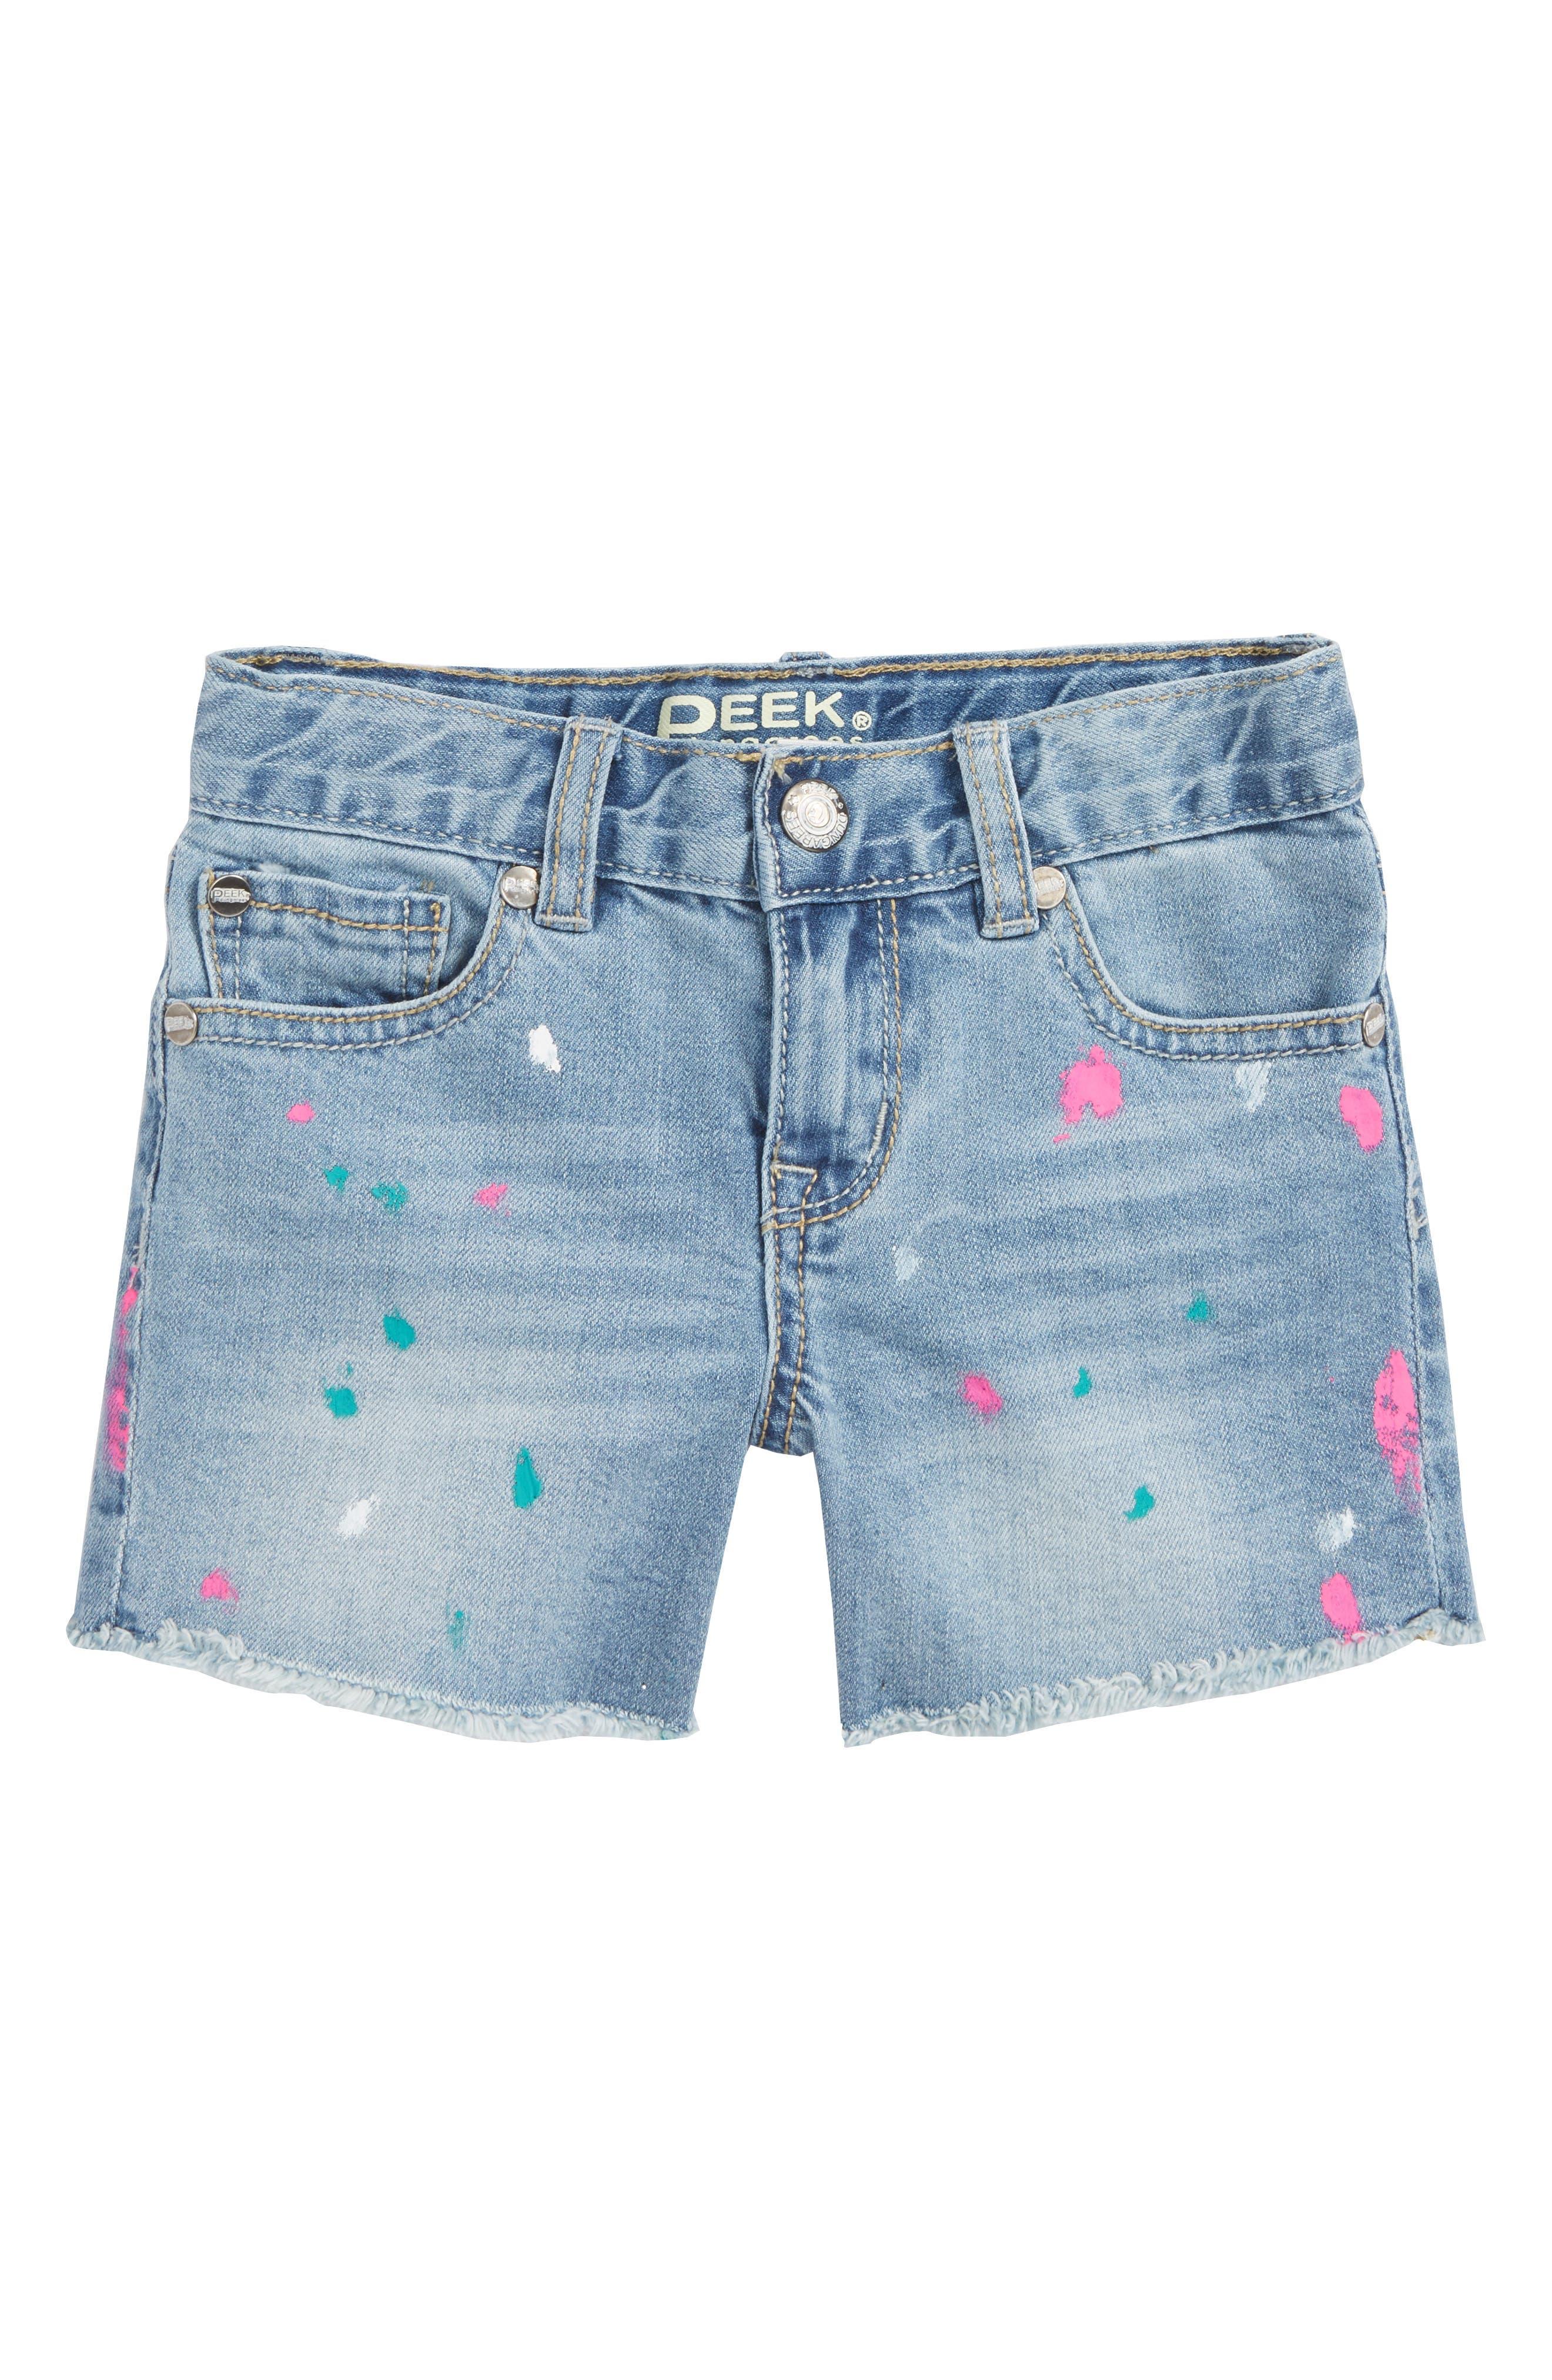 Peek Griffin Paint Splatter Denim Shorts (Toddler Girls, Little Girls & Big Girls)